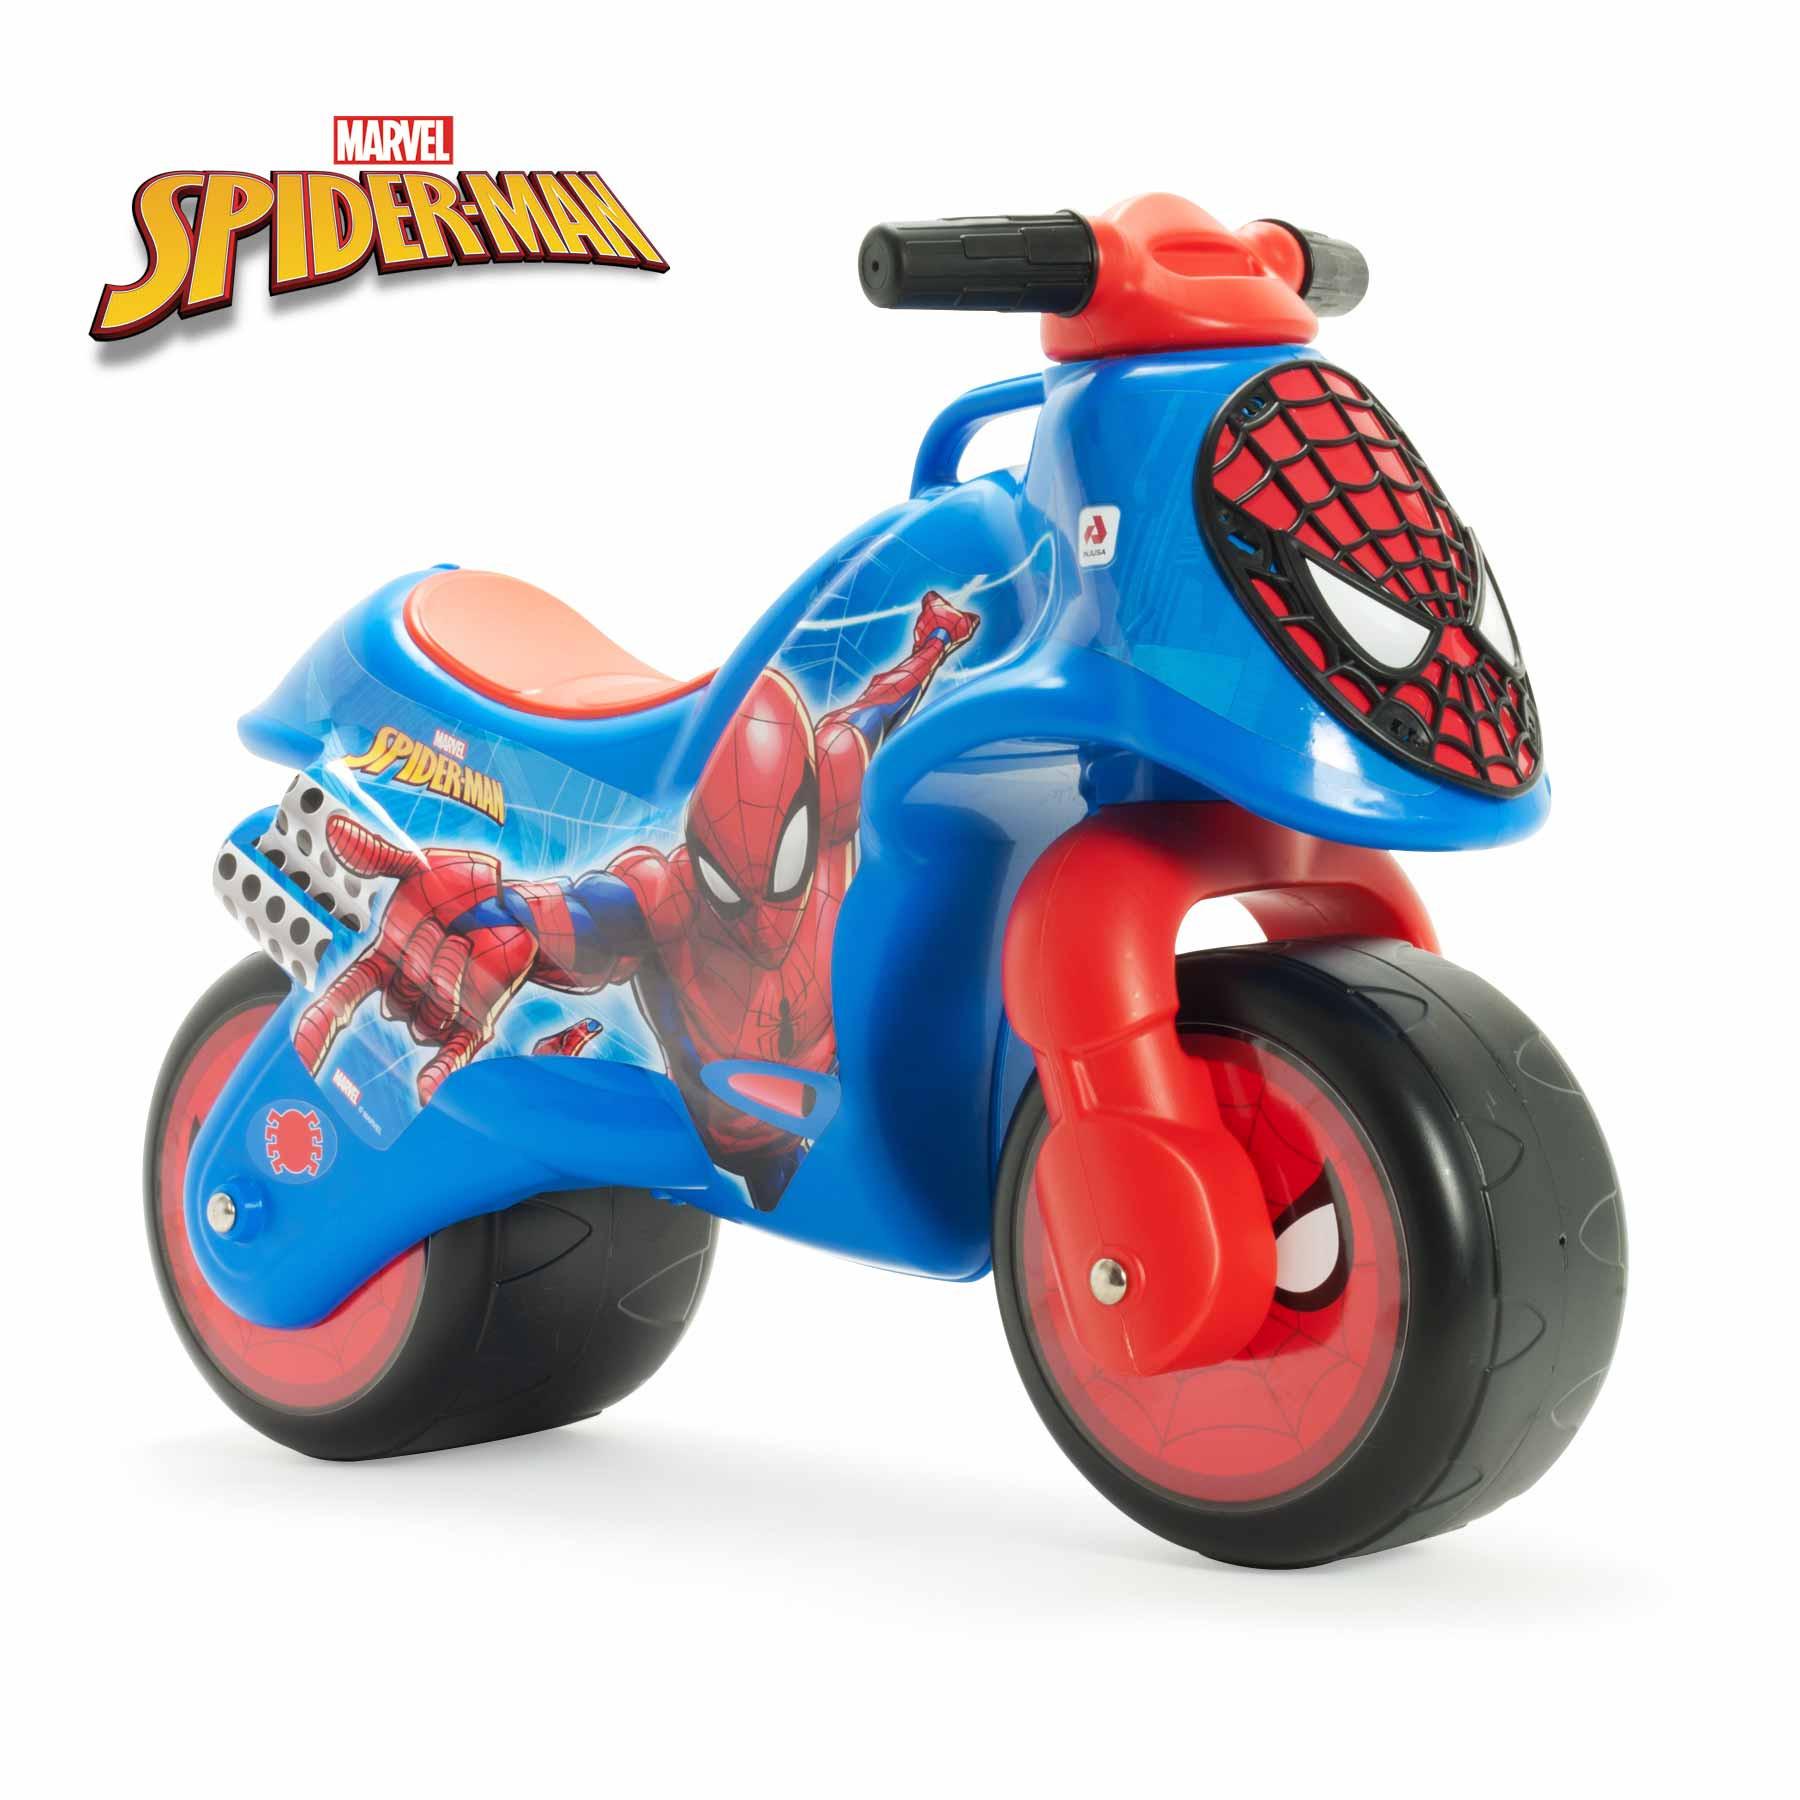 Mota andador Neox Spiderman